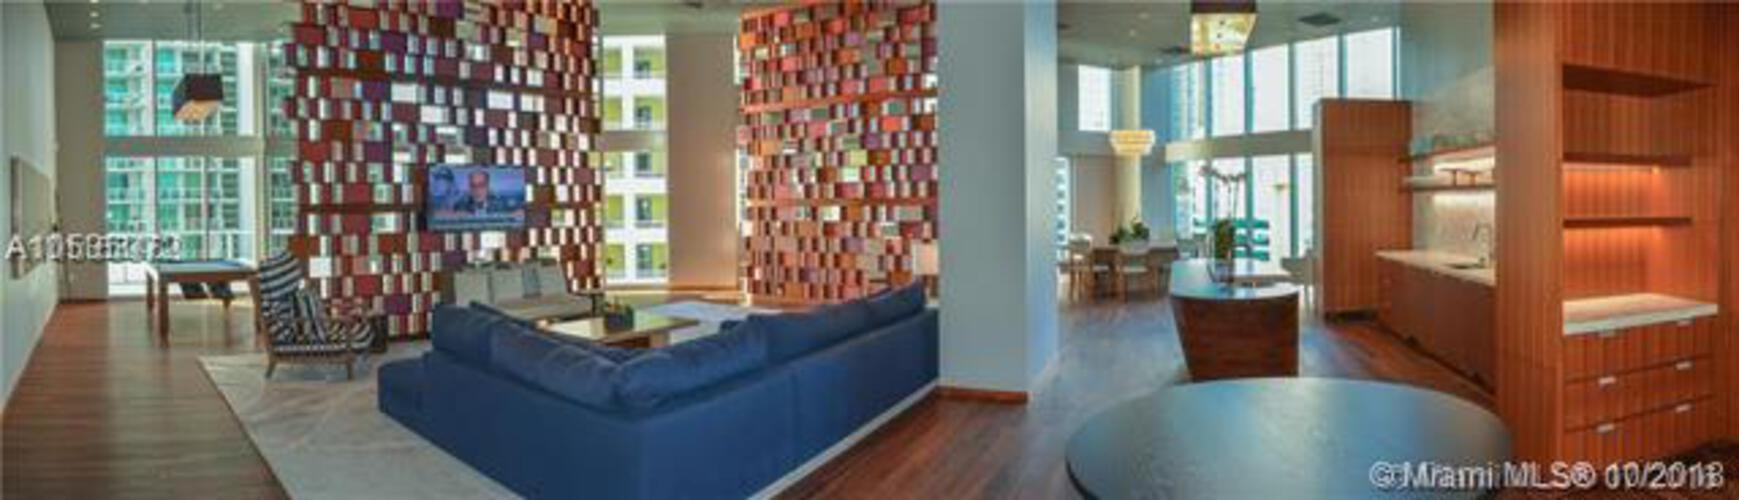 1300 Brickell Bay Drive, Miami, FL 33131, Brickell House #3001, Brickell, Miami A10535372 image #25